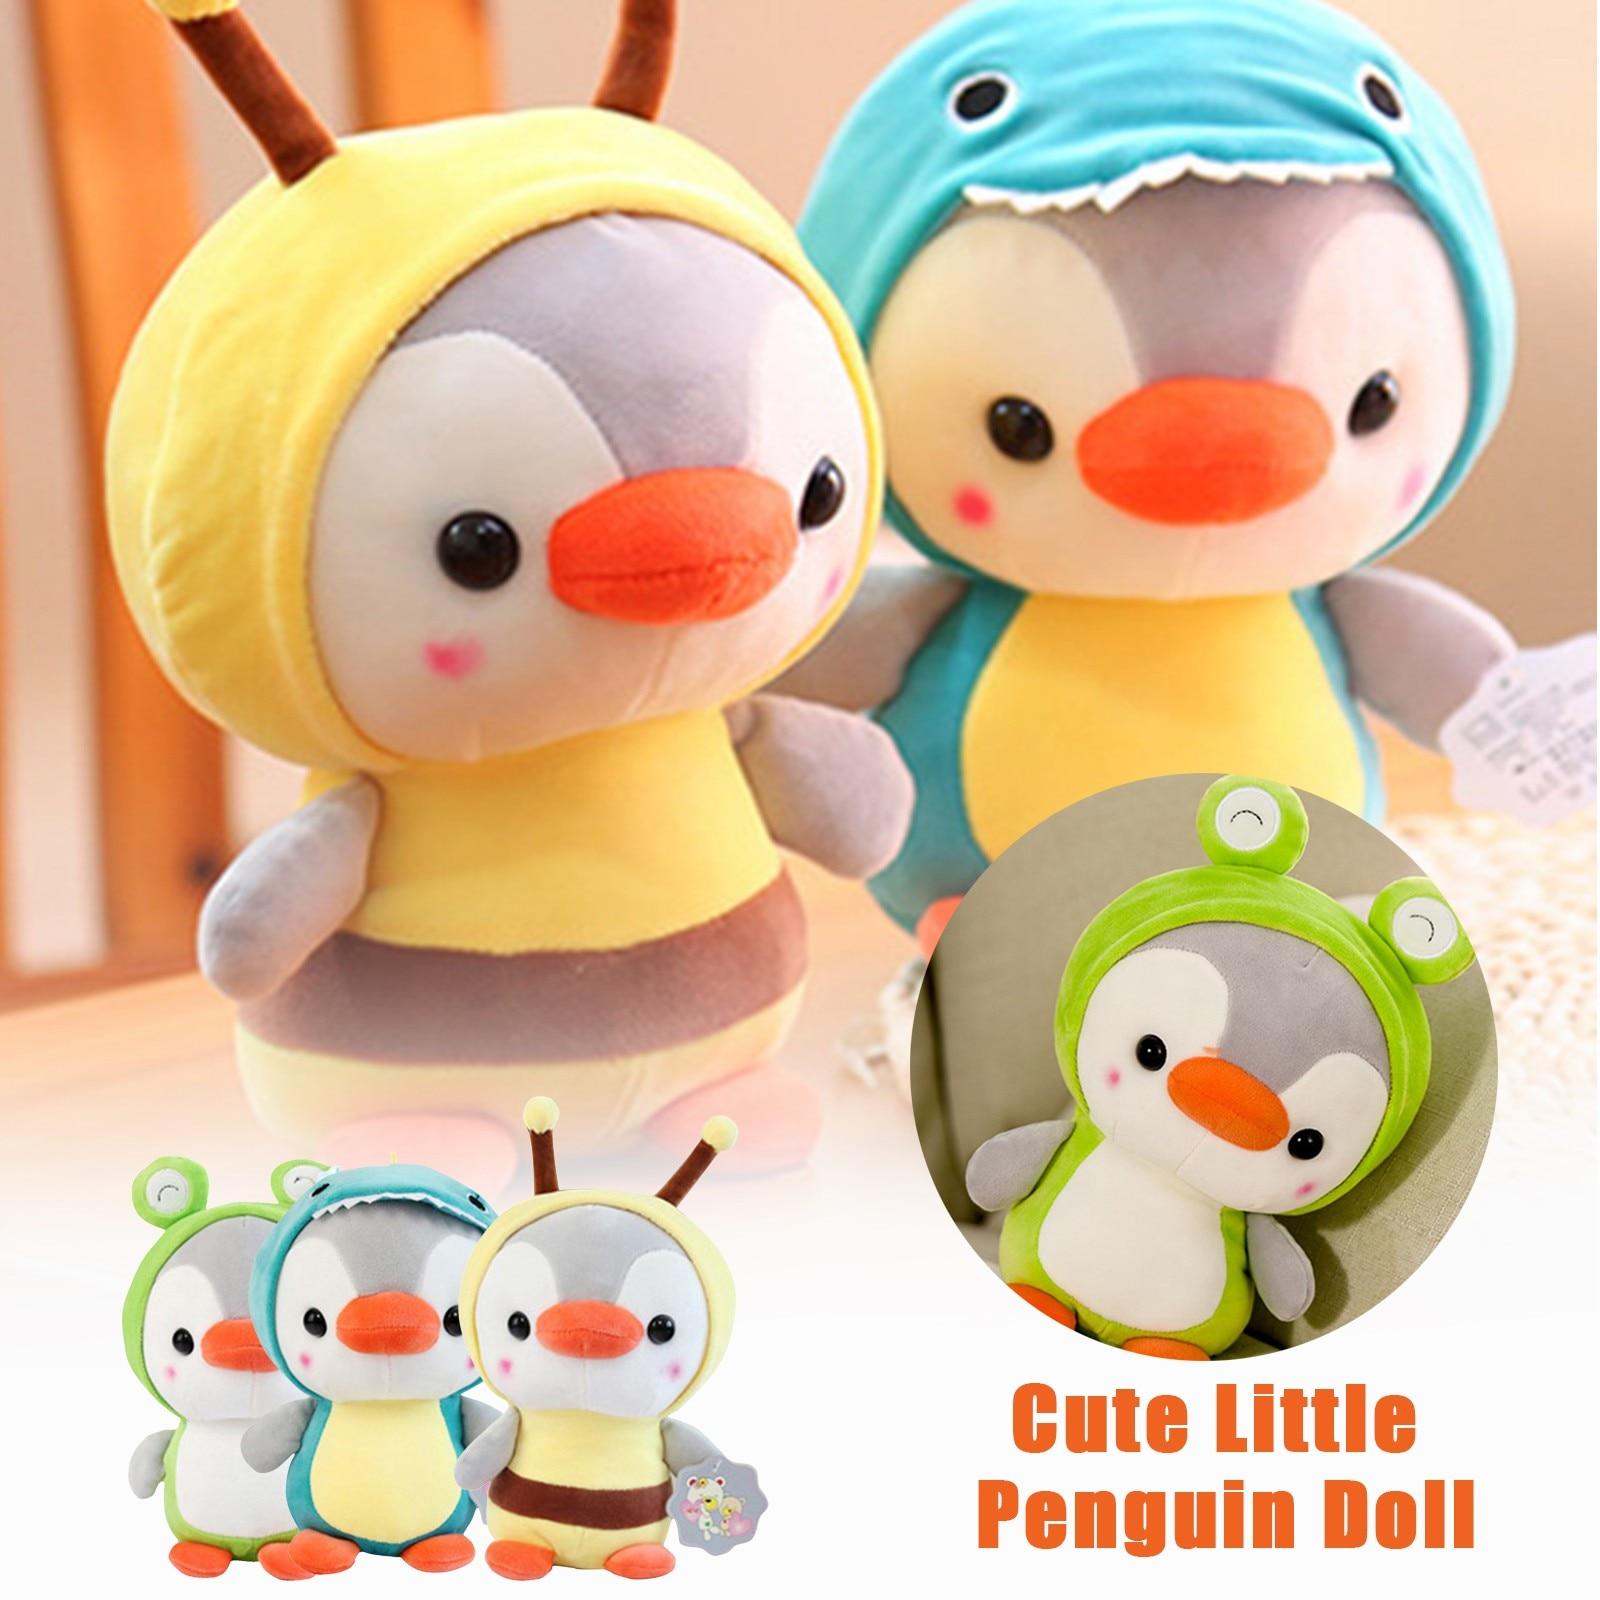 Cute cartoon penguin doll plush toy For Kids Cute Soft Plush Stuffed Doll Toys super soft penguin pillow Children birthday gifts недорого